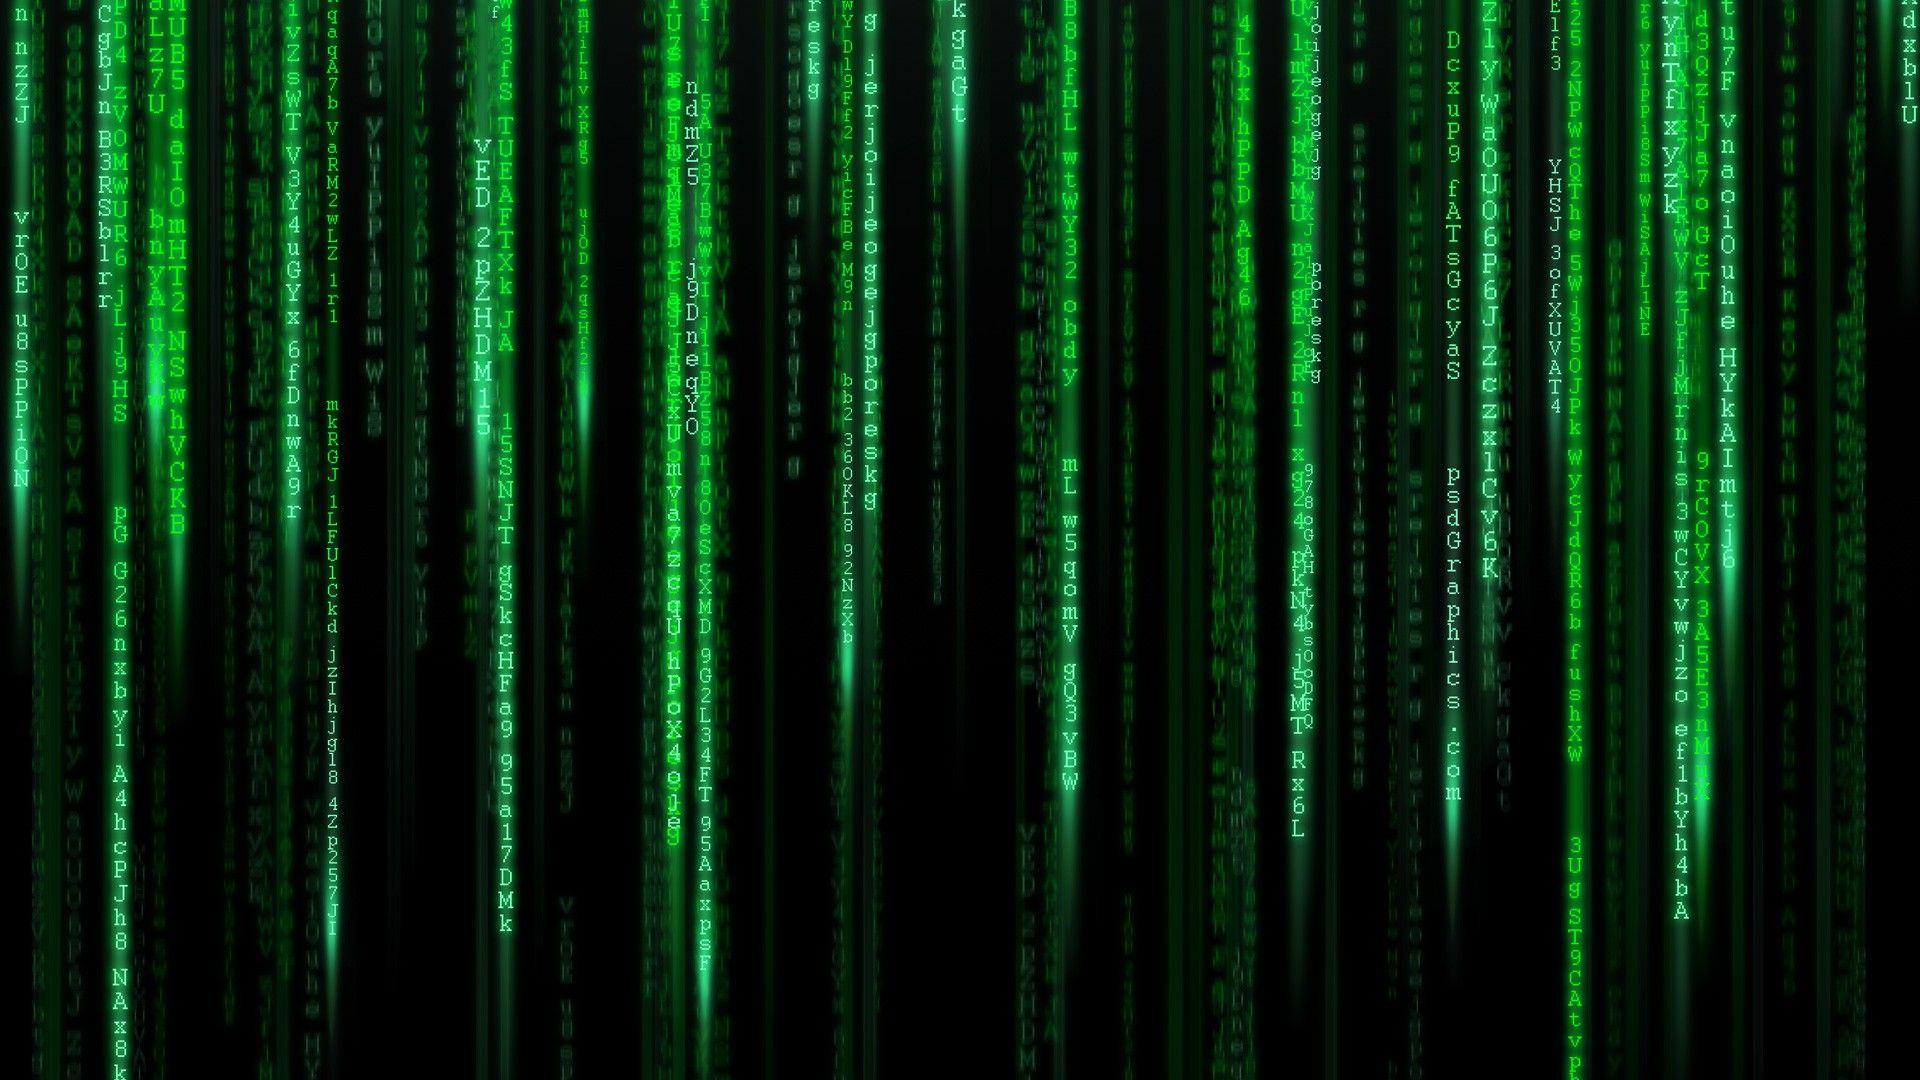 Matrix 1080p Background Picture Image 1920x1080